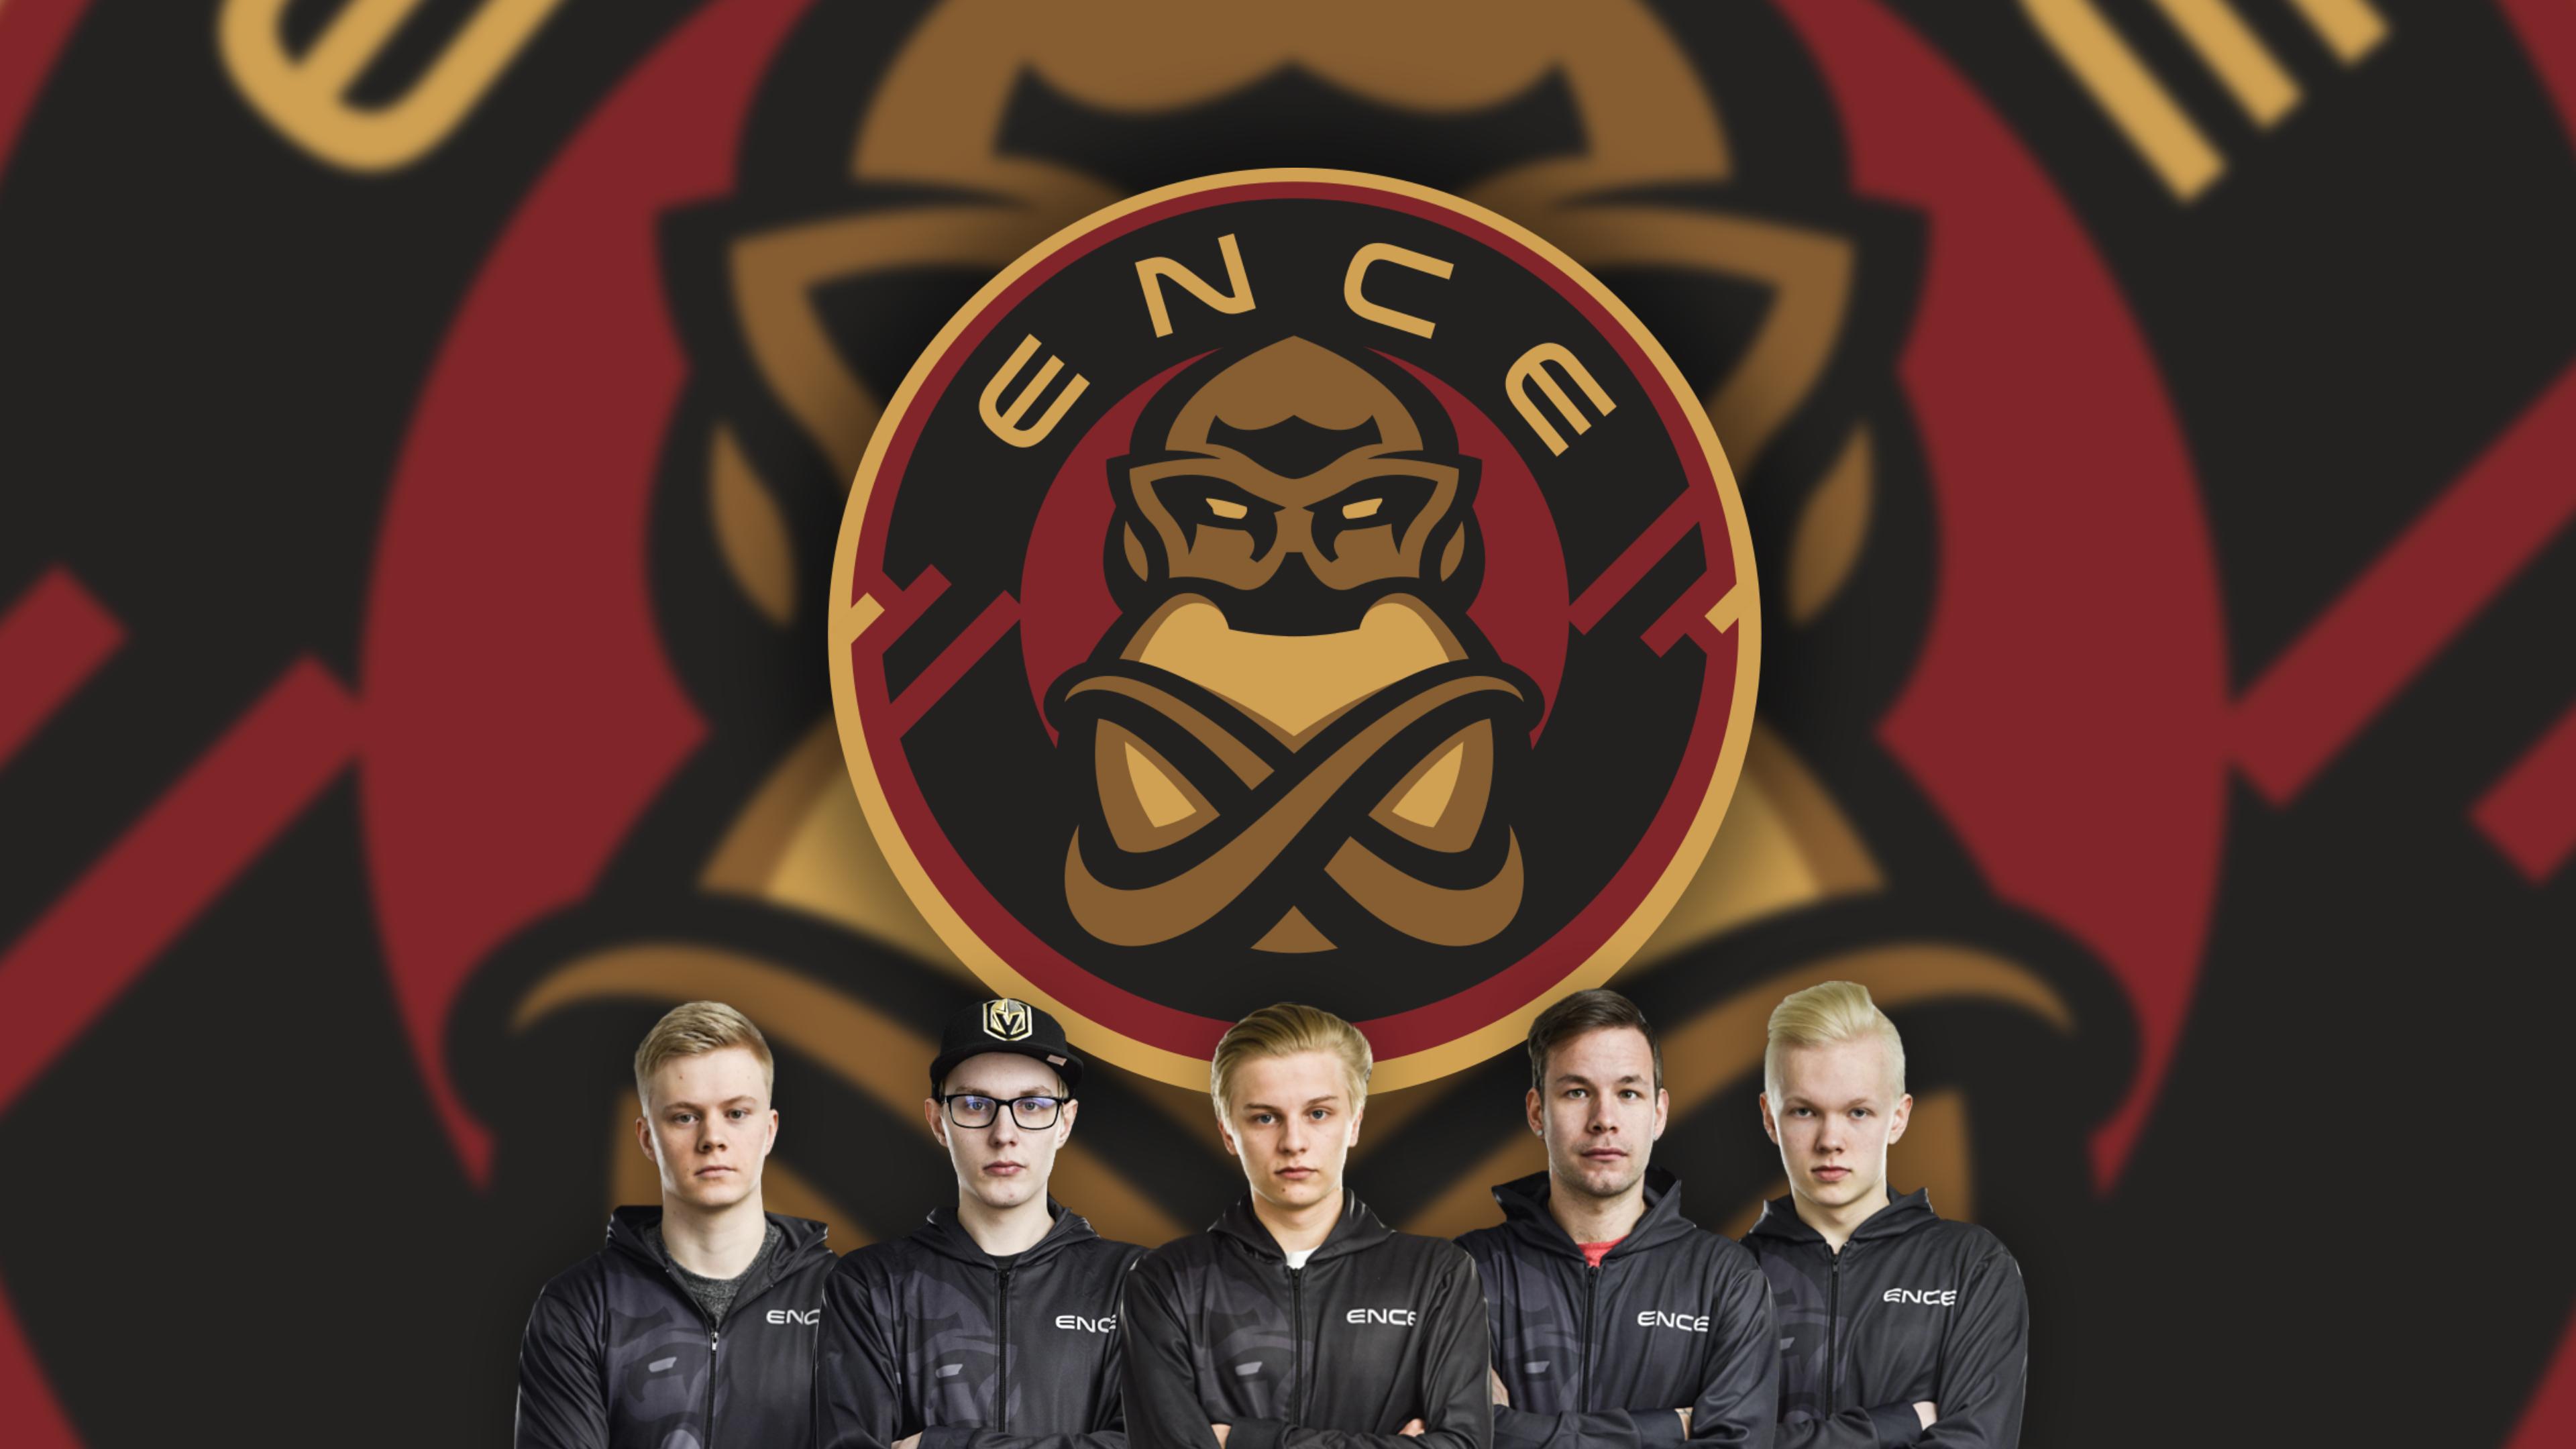 ENCE Wallpaper w/ Players